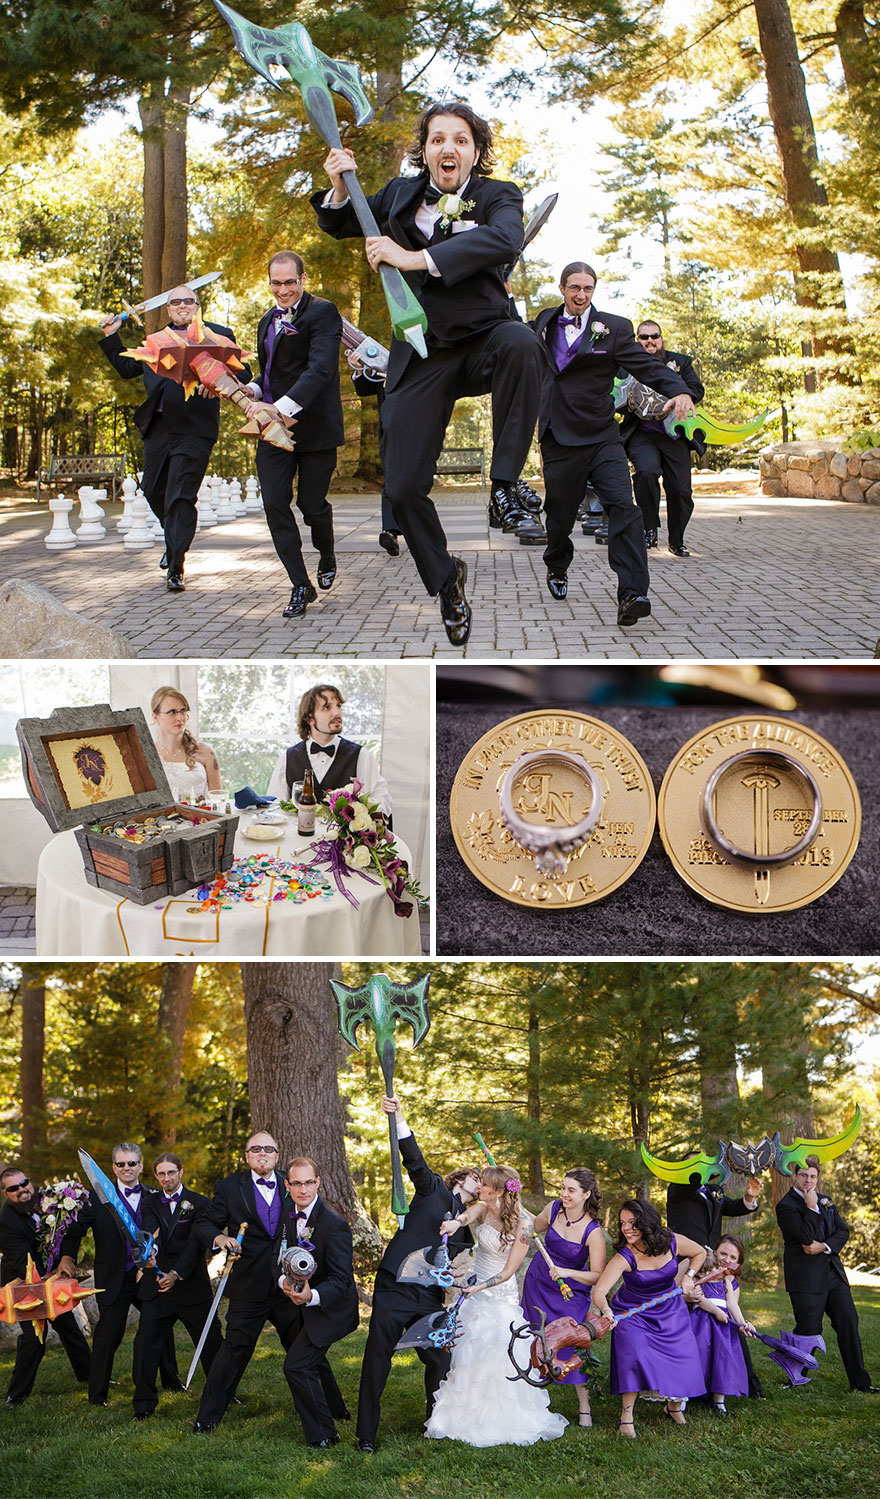 World Of Warcraft Themed Wedding